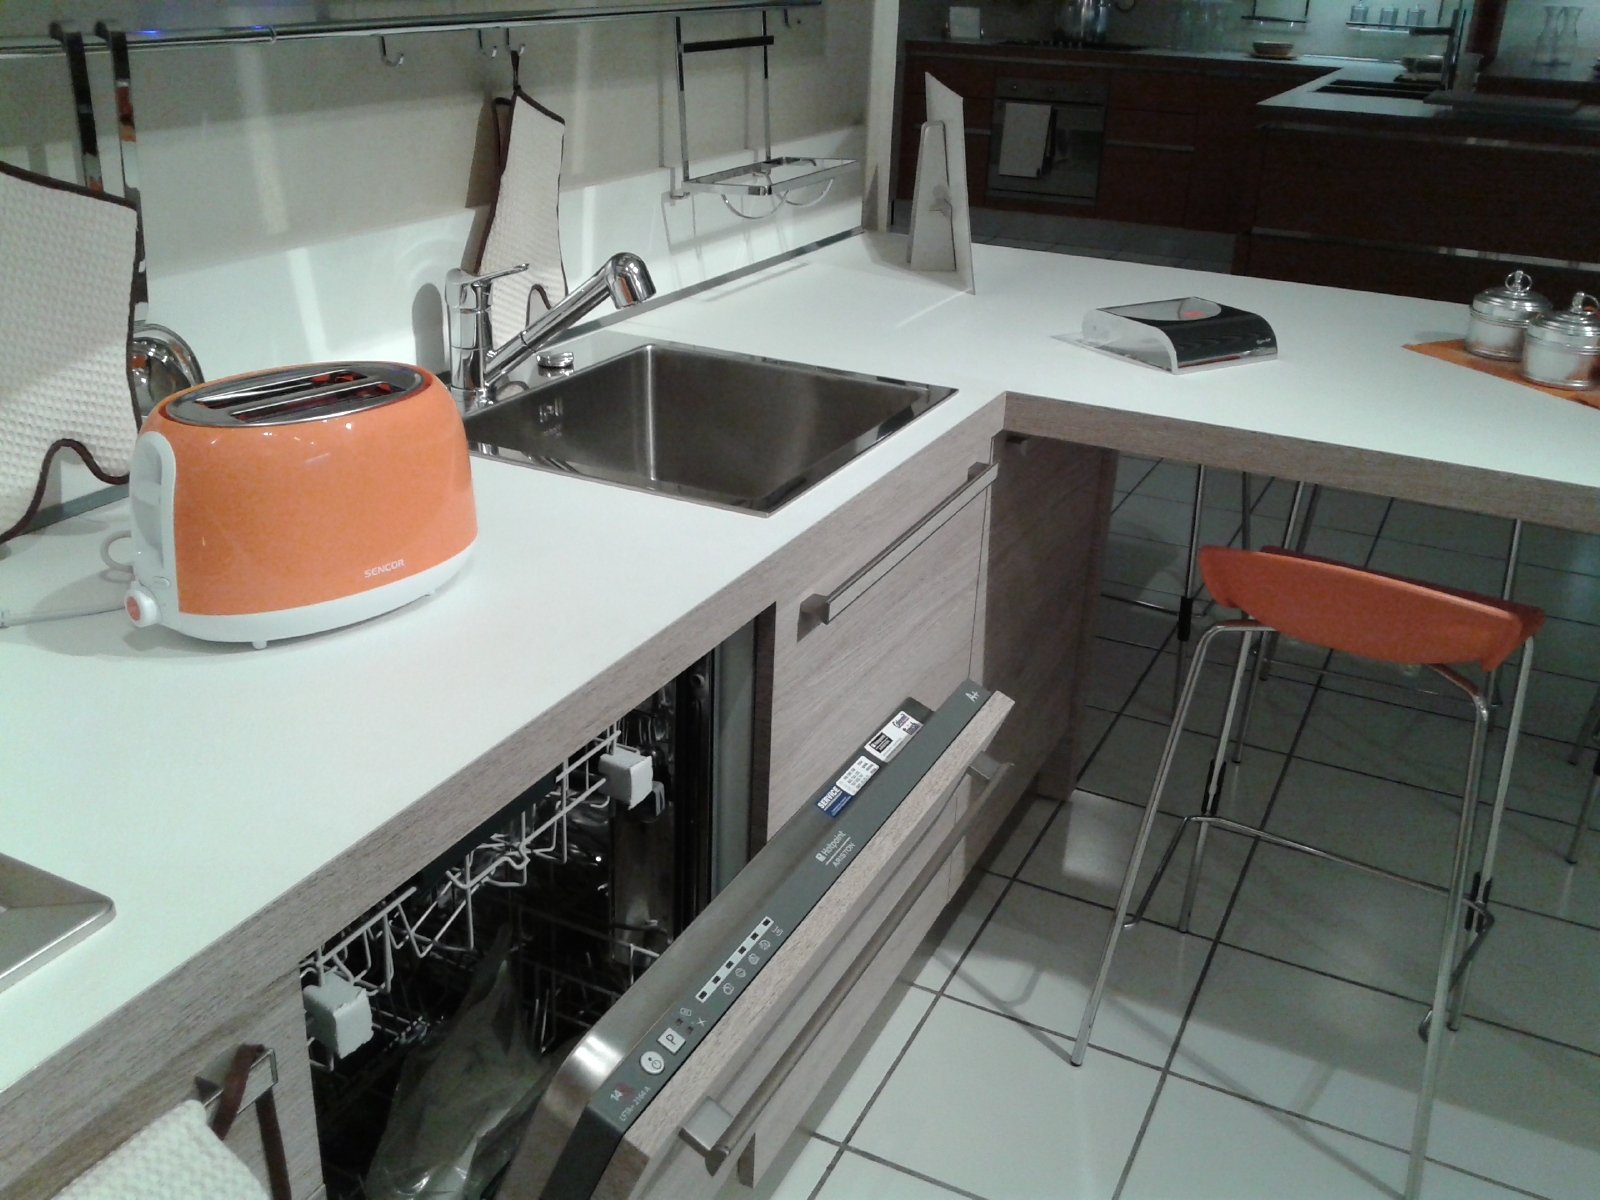 Cucina Veneta Cucine Ethica Decorativo Laminato Materico Cucine A  #9A5331 1600 1200 Veneta Cucine è Una Buona Marca